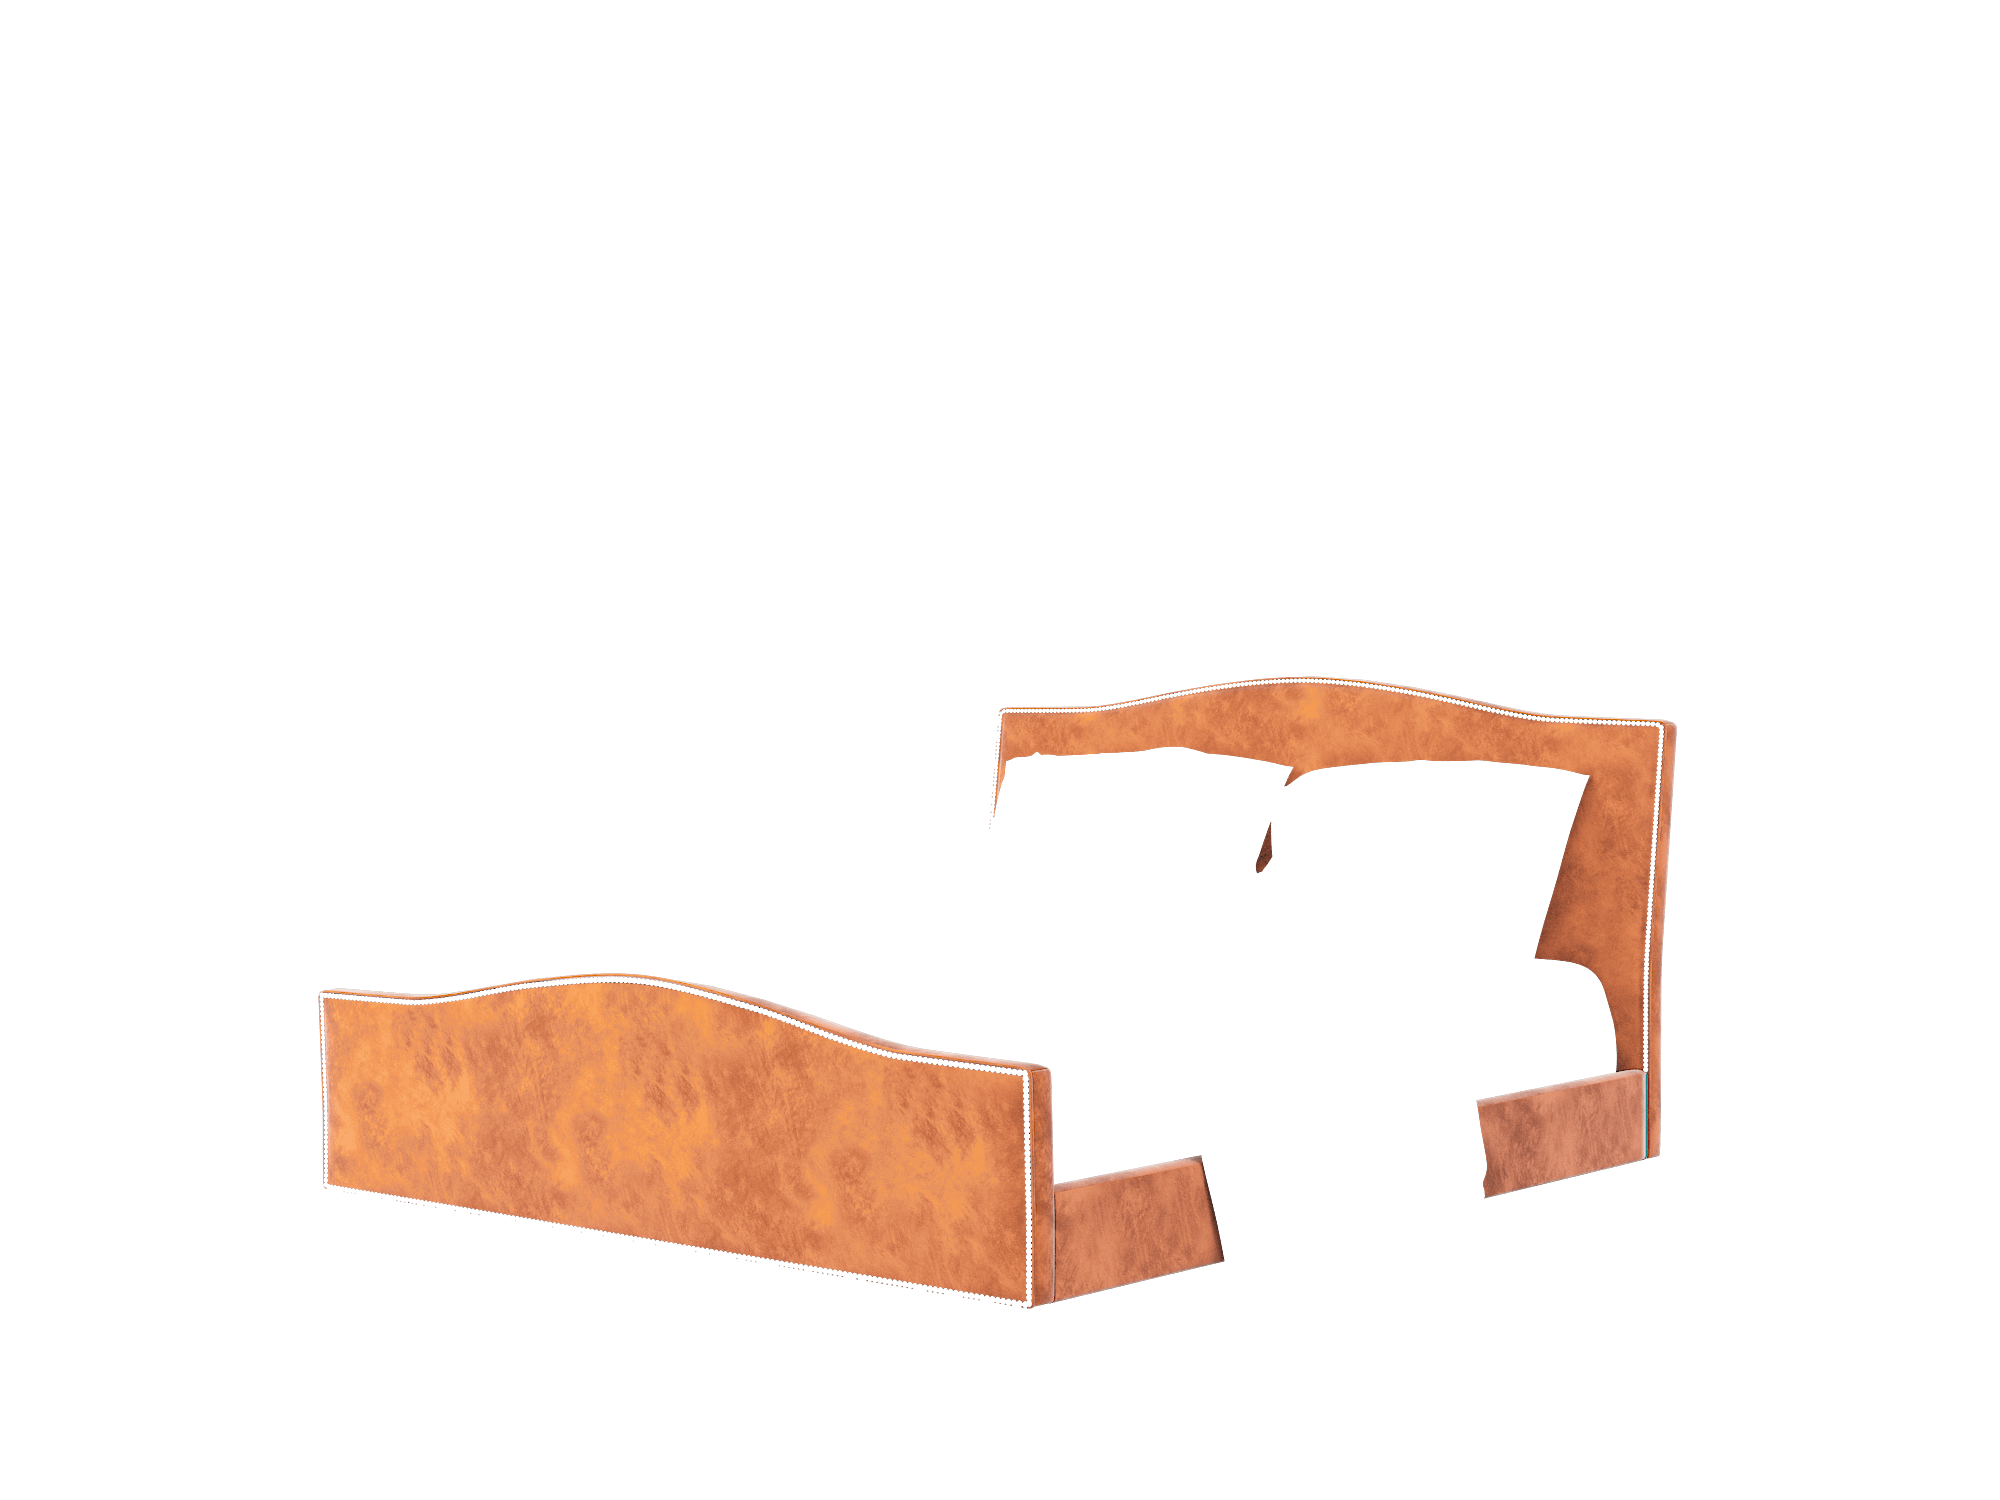 Prato Loft Copper Bed King Room Texture